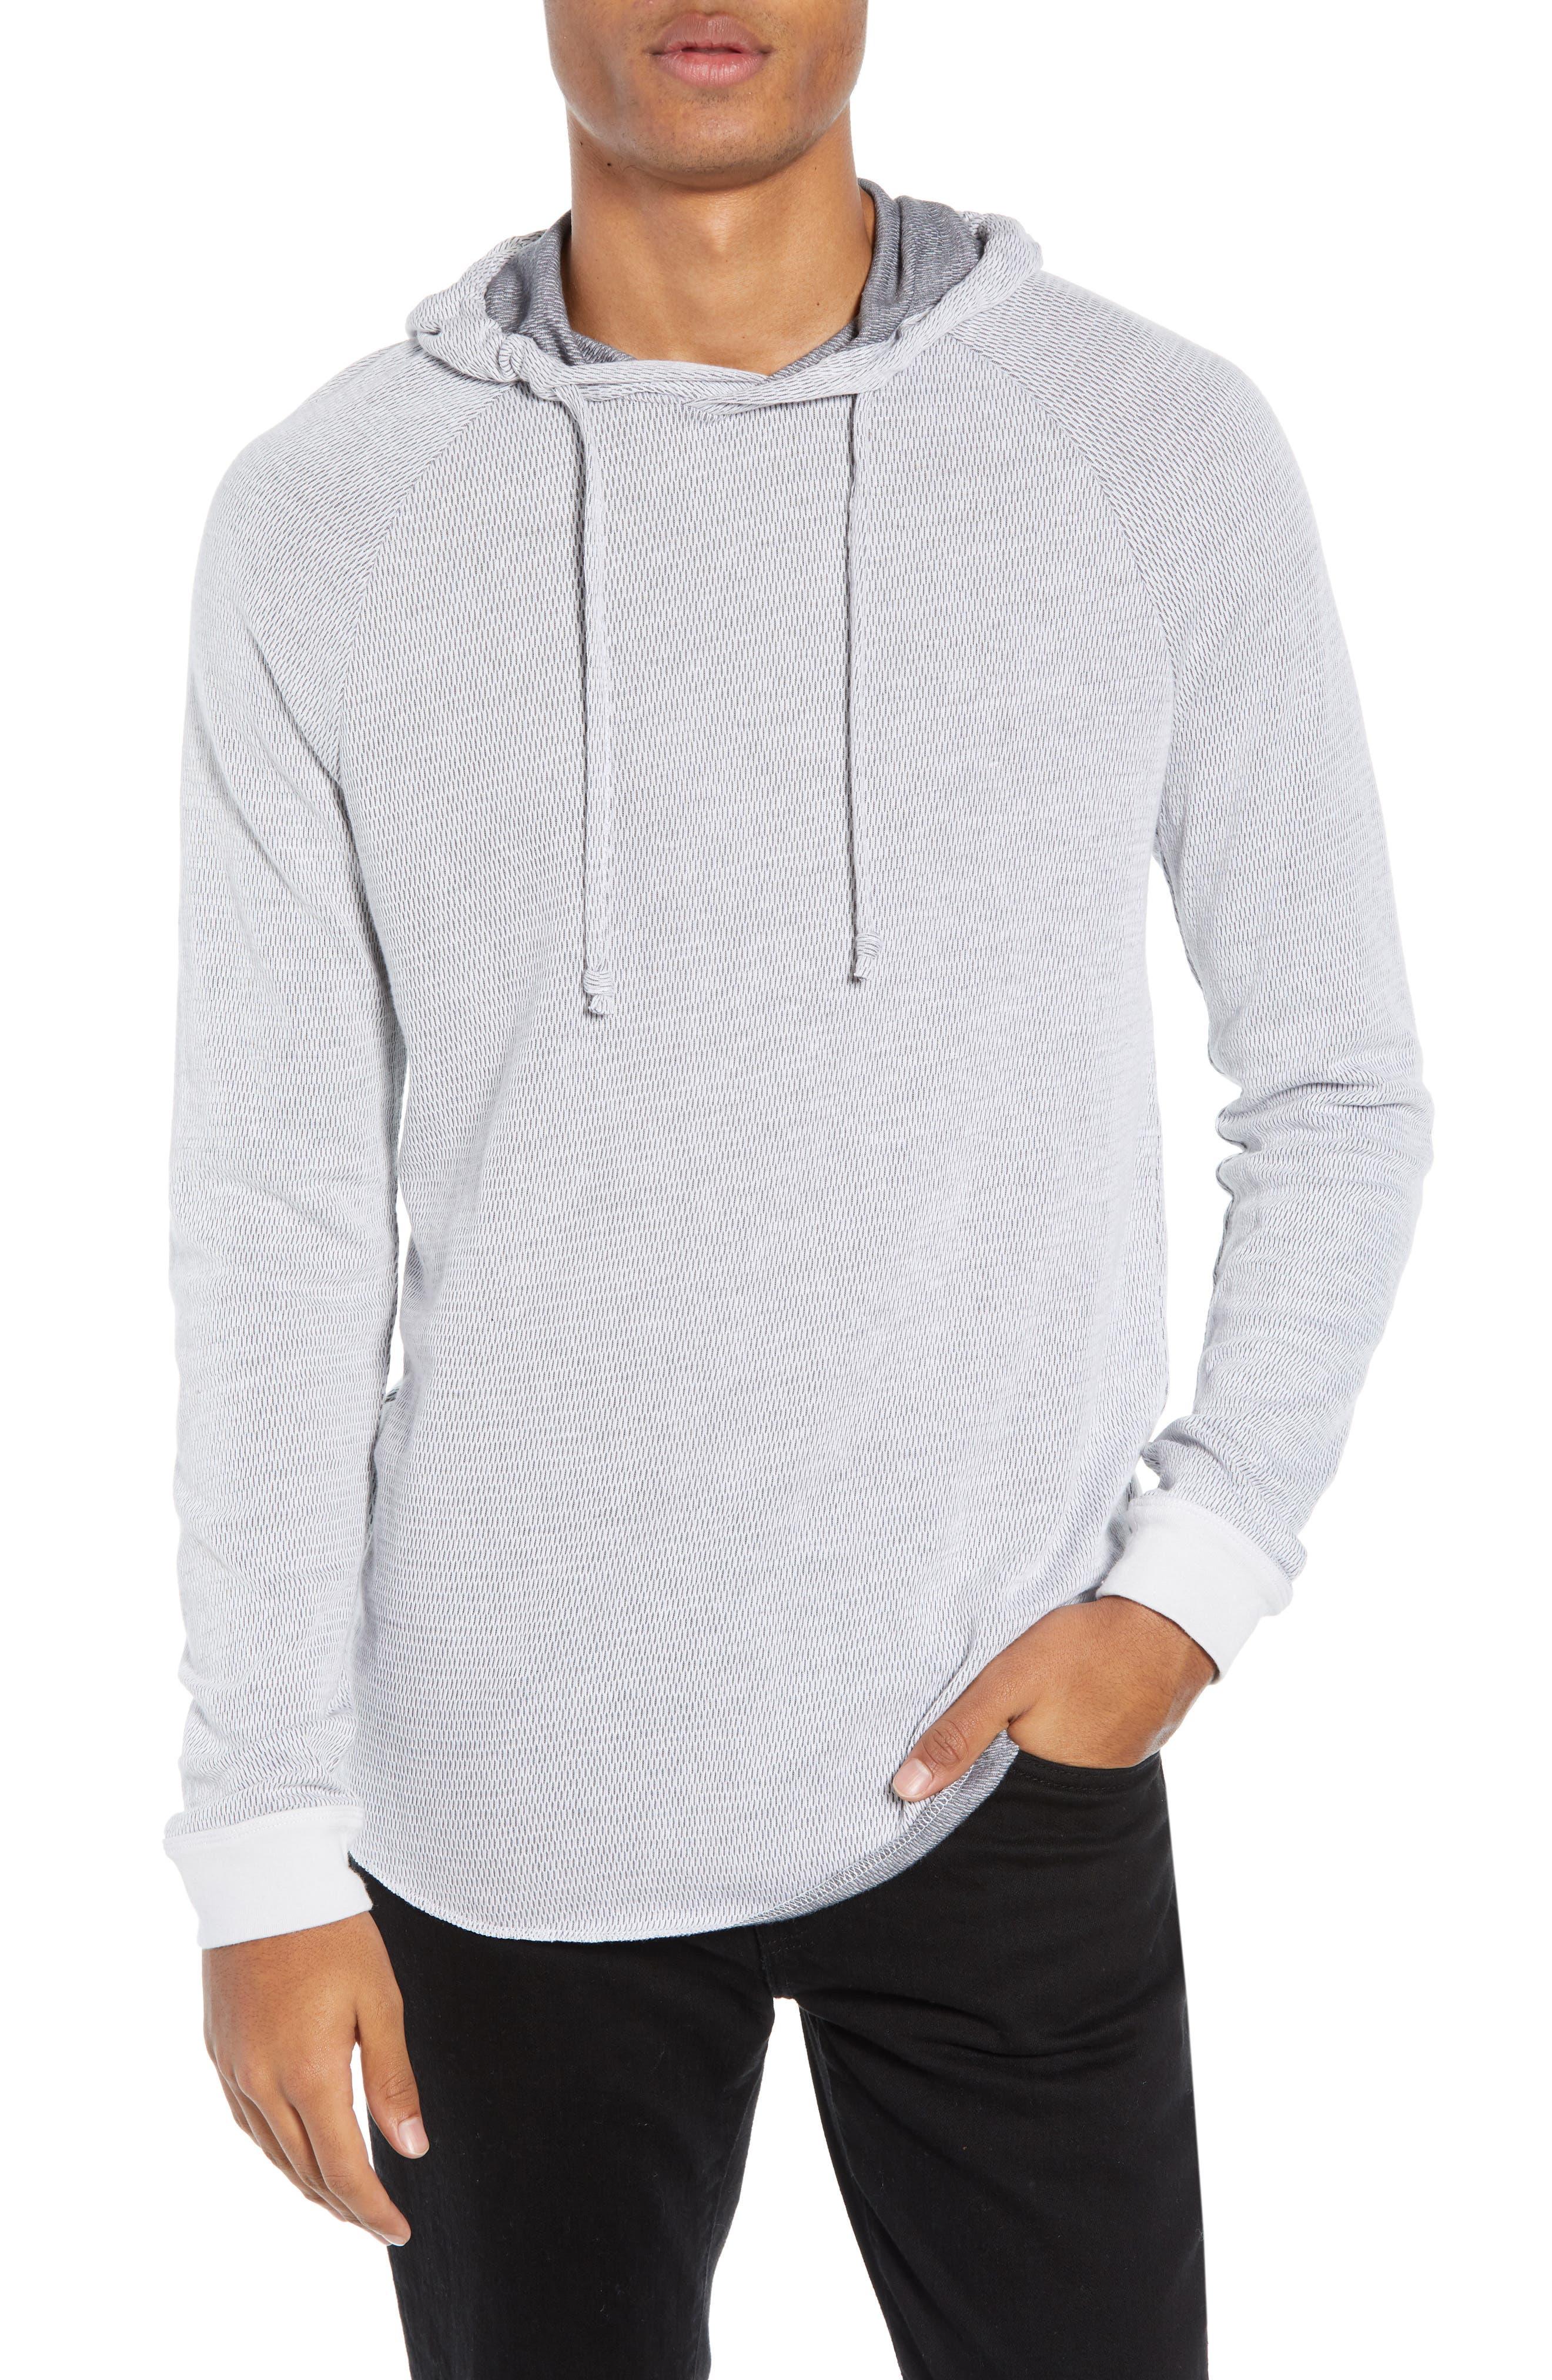 Thermal Knit Raglan Hoodie,                         Main,                         color, GREY/ WHITE TWO TONE